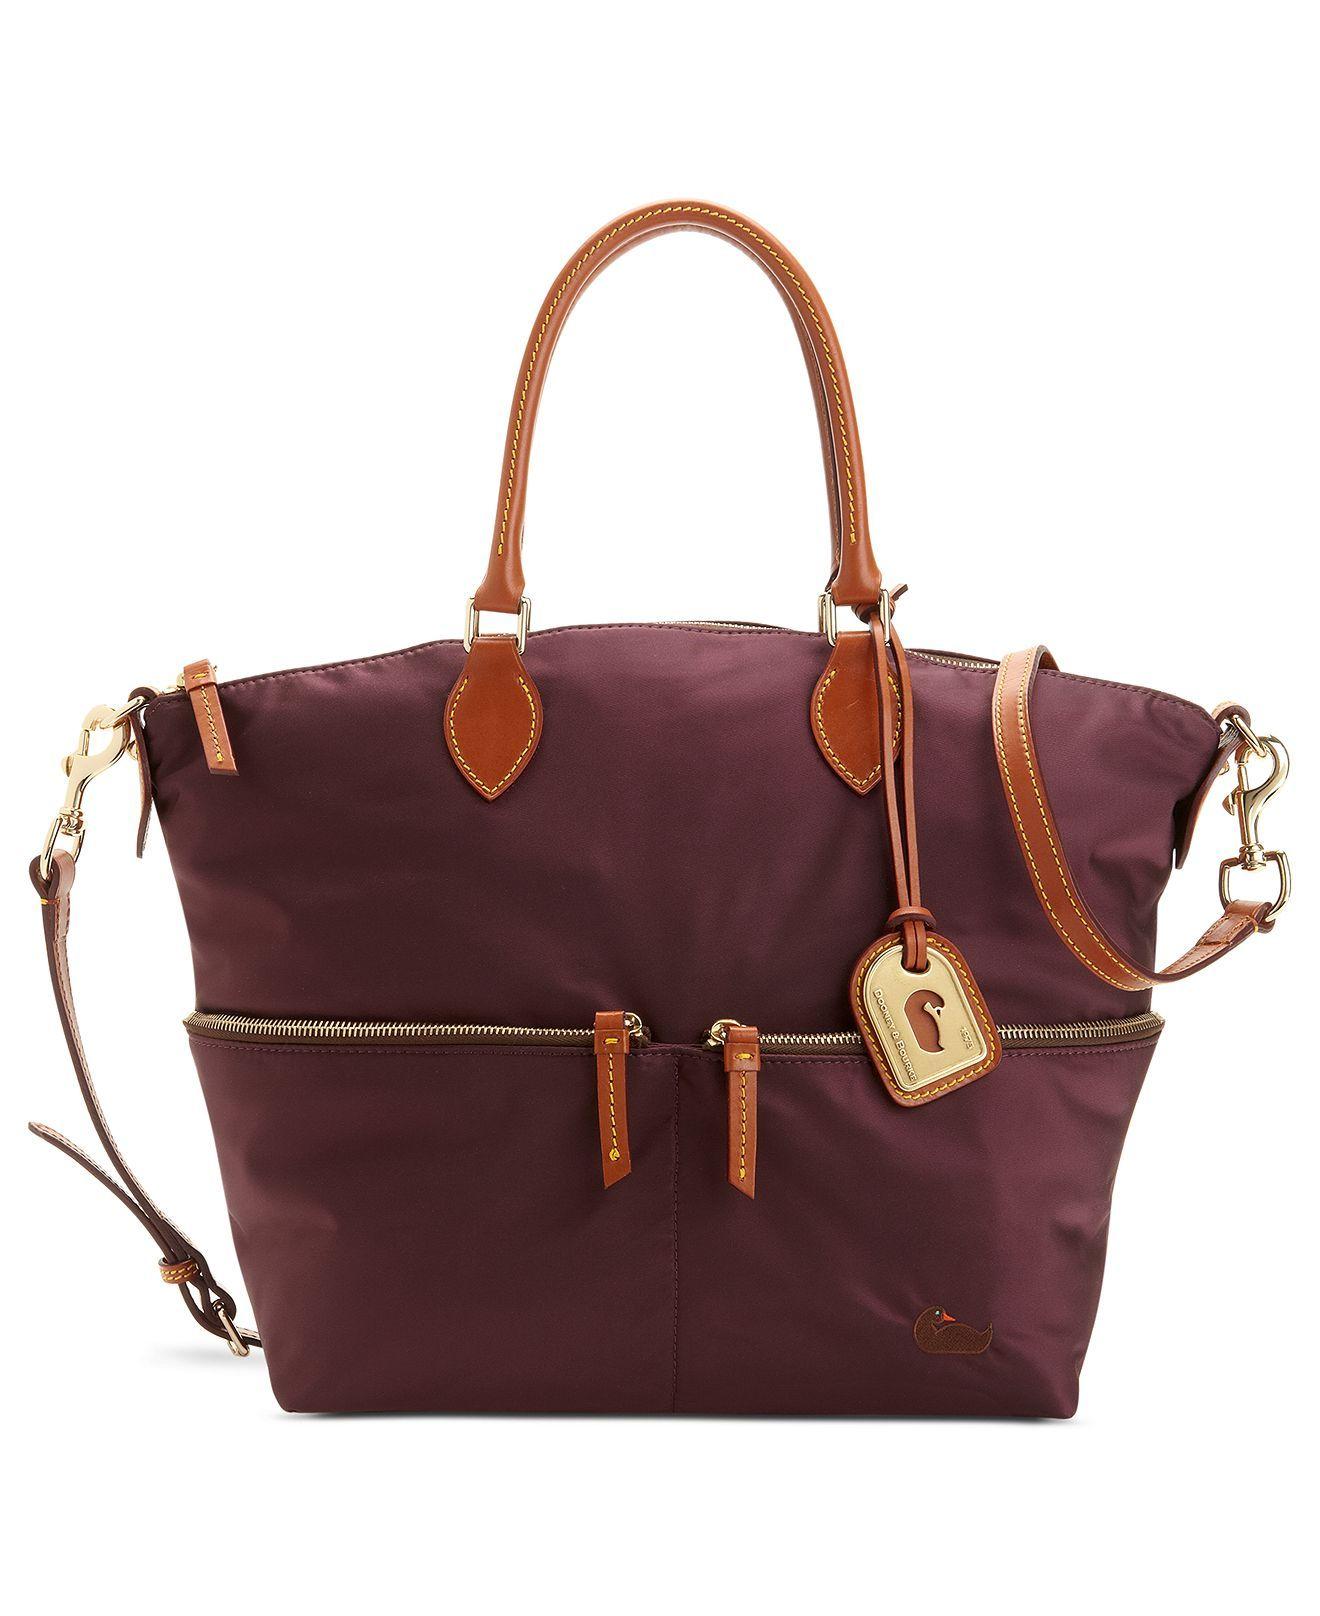 Dooney Bourke Handbag Nylon Vanessa Bag Handbags Accessories Macy S